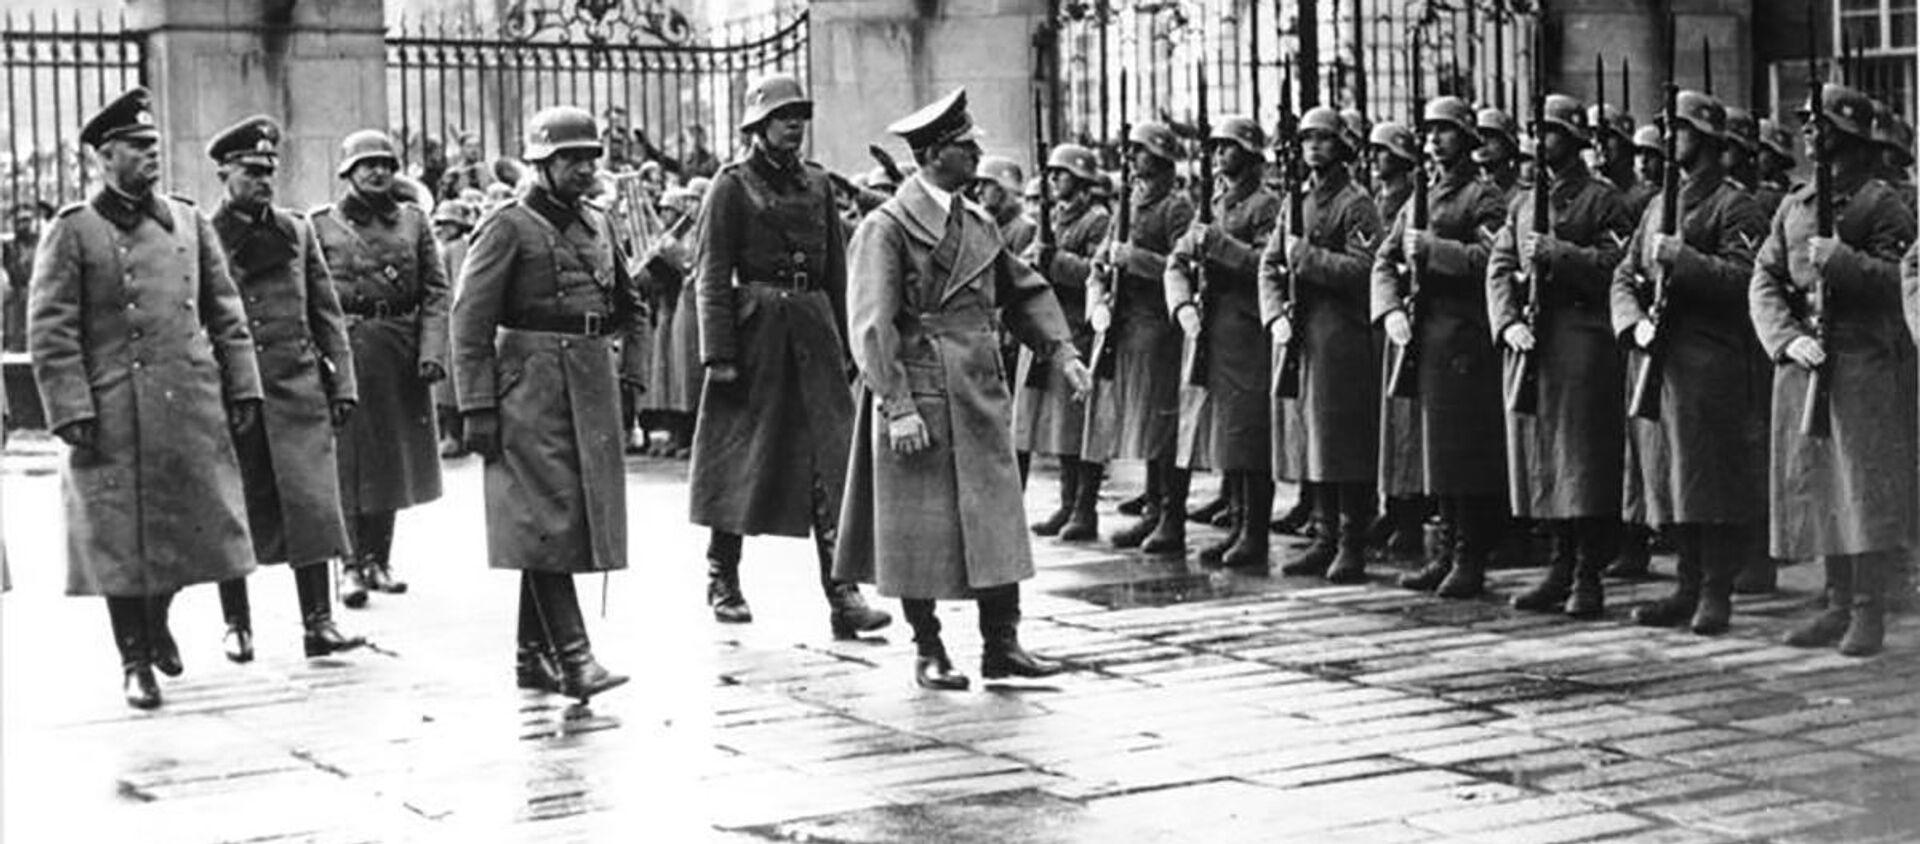 Adolf Hitler v Praze. 15.3.1939   - Sputnik Česká republika, 1920, 16.03.2021